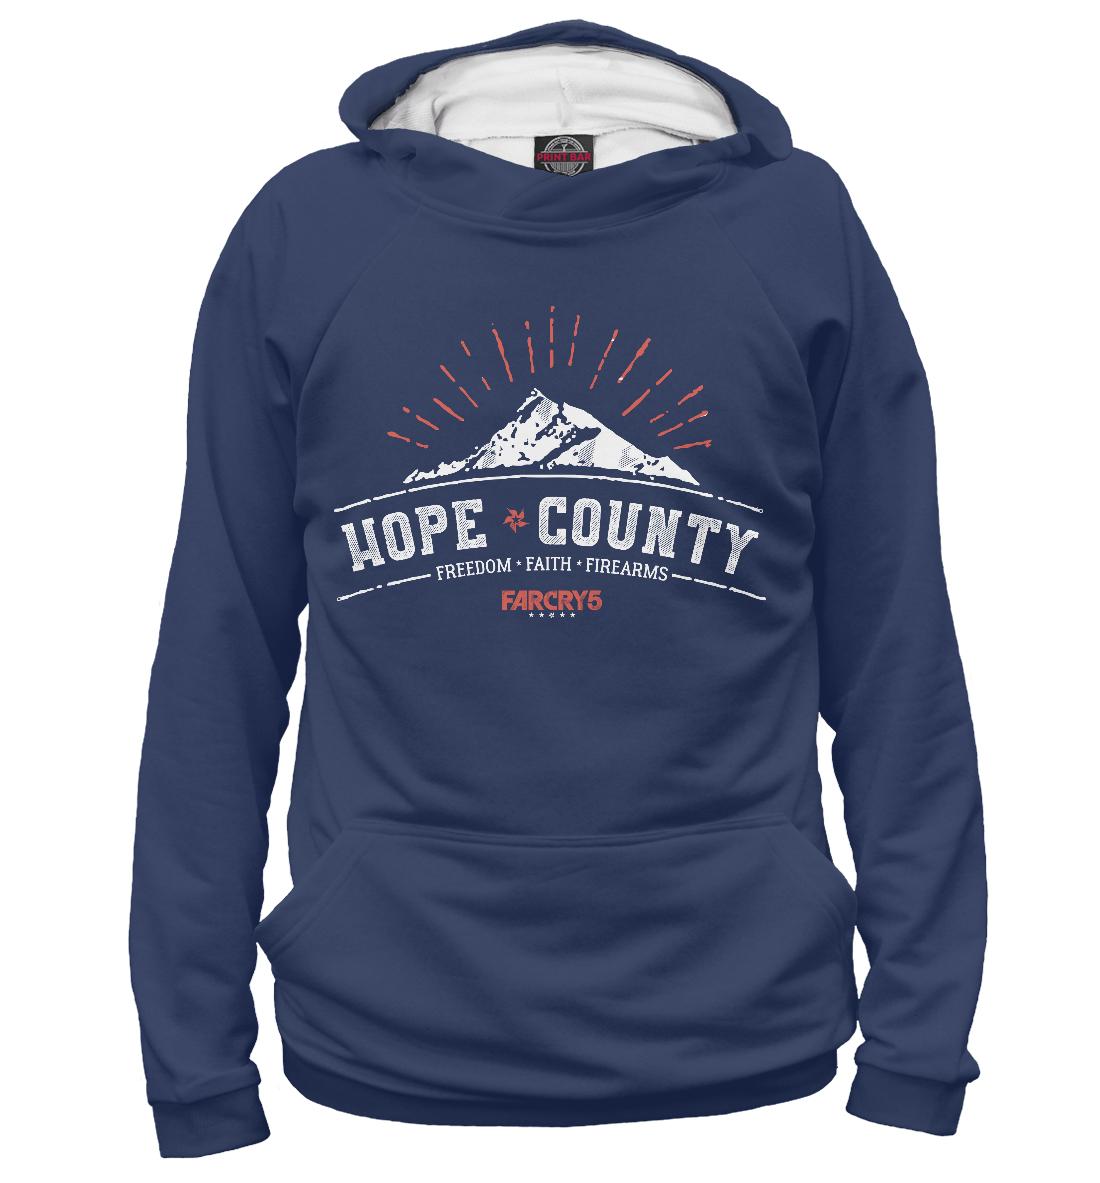 far cray 5 hope county 2 Far Cry 5. Hope County